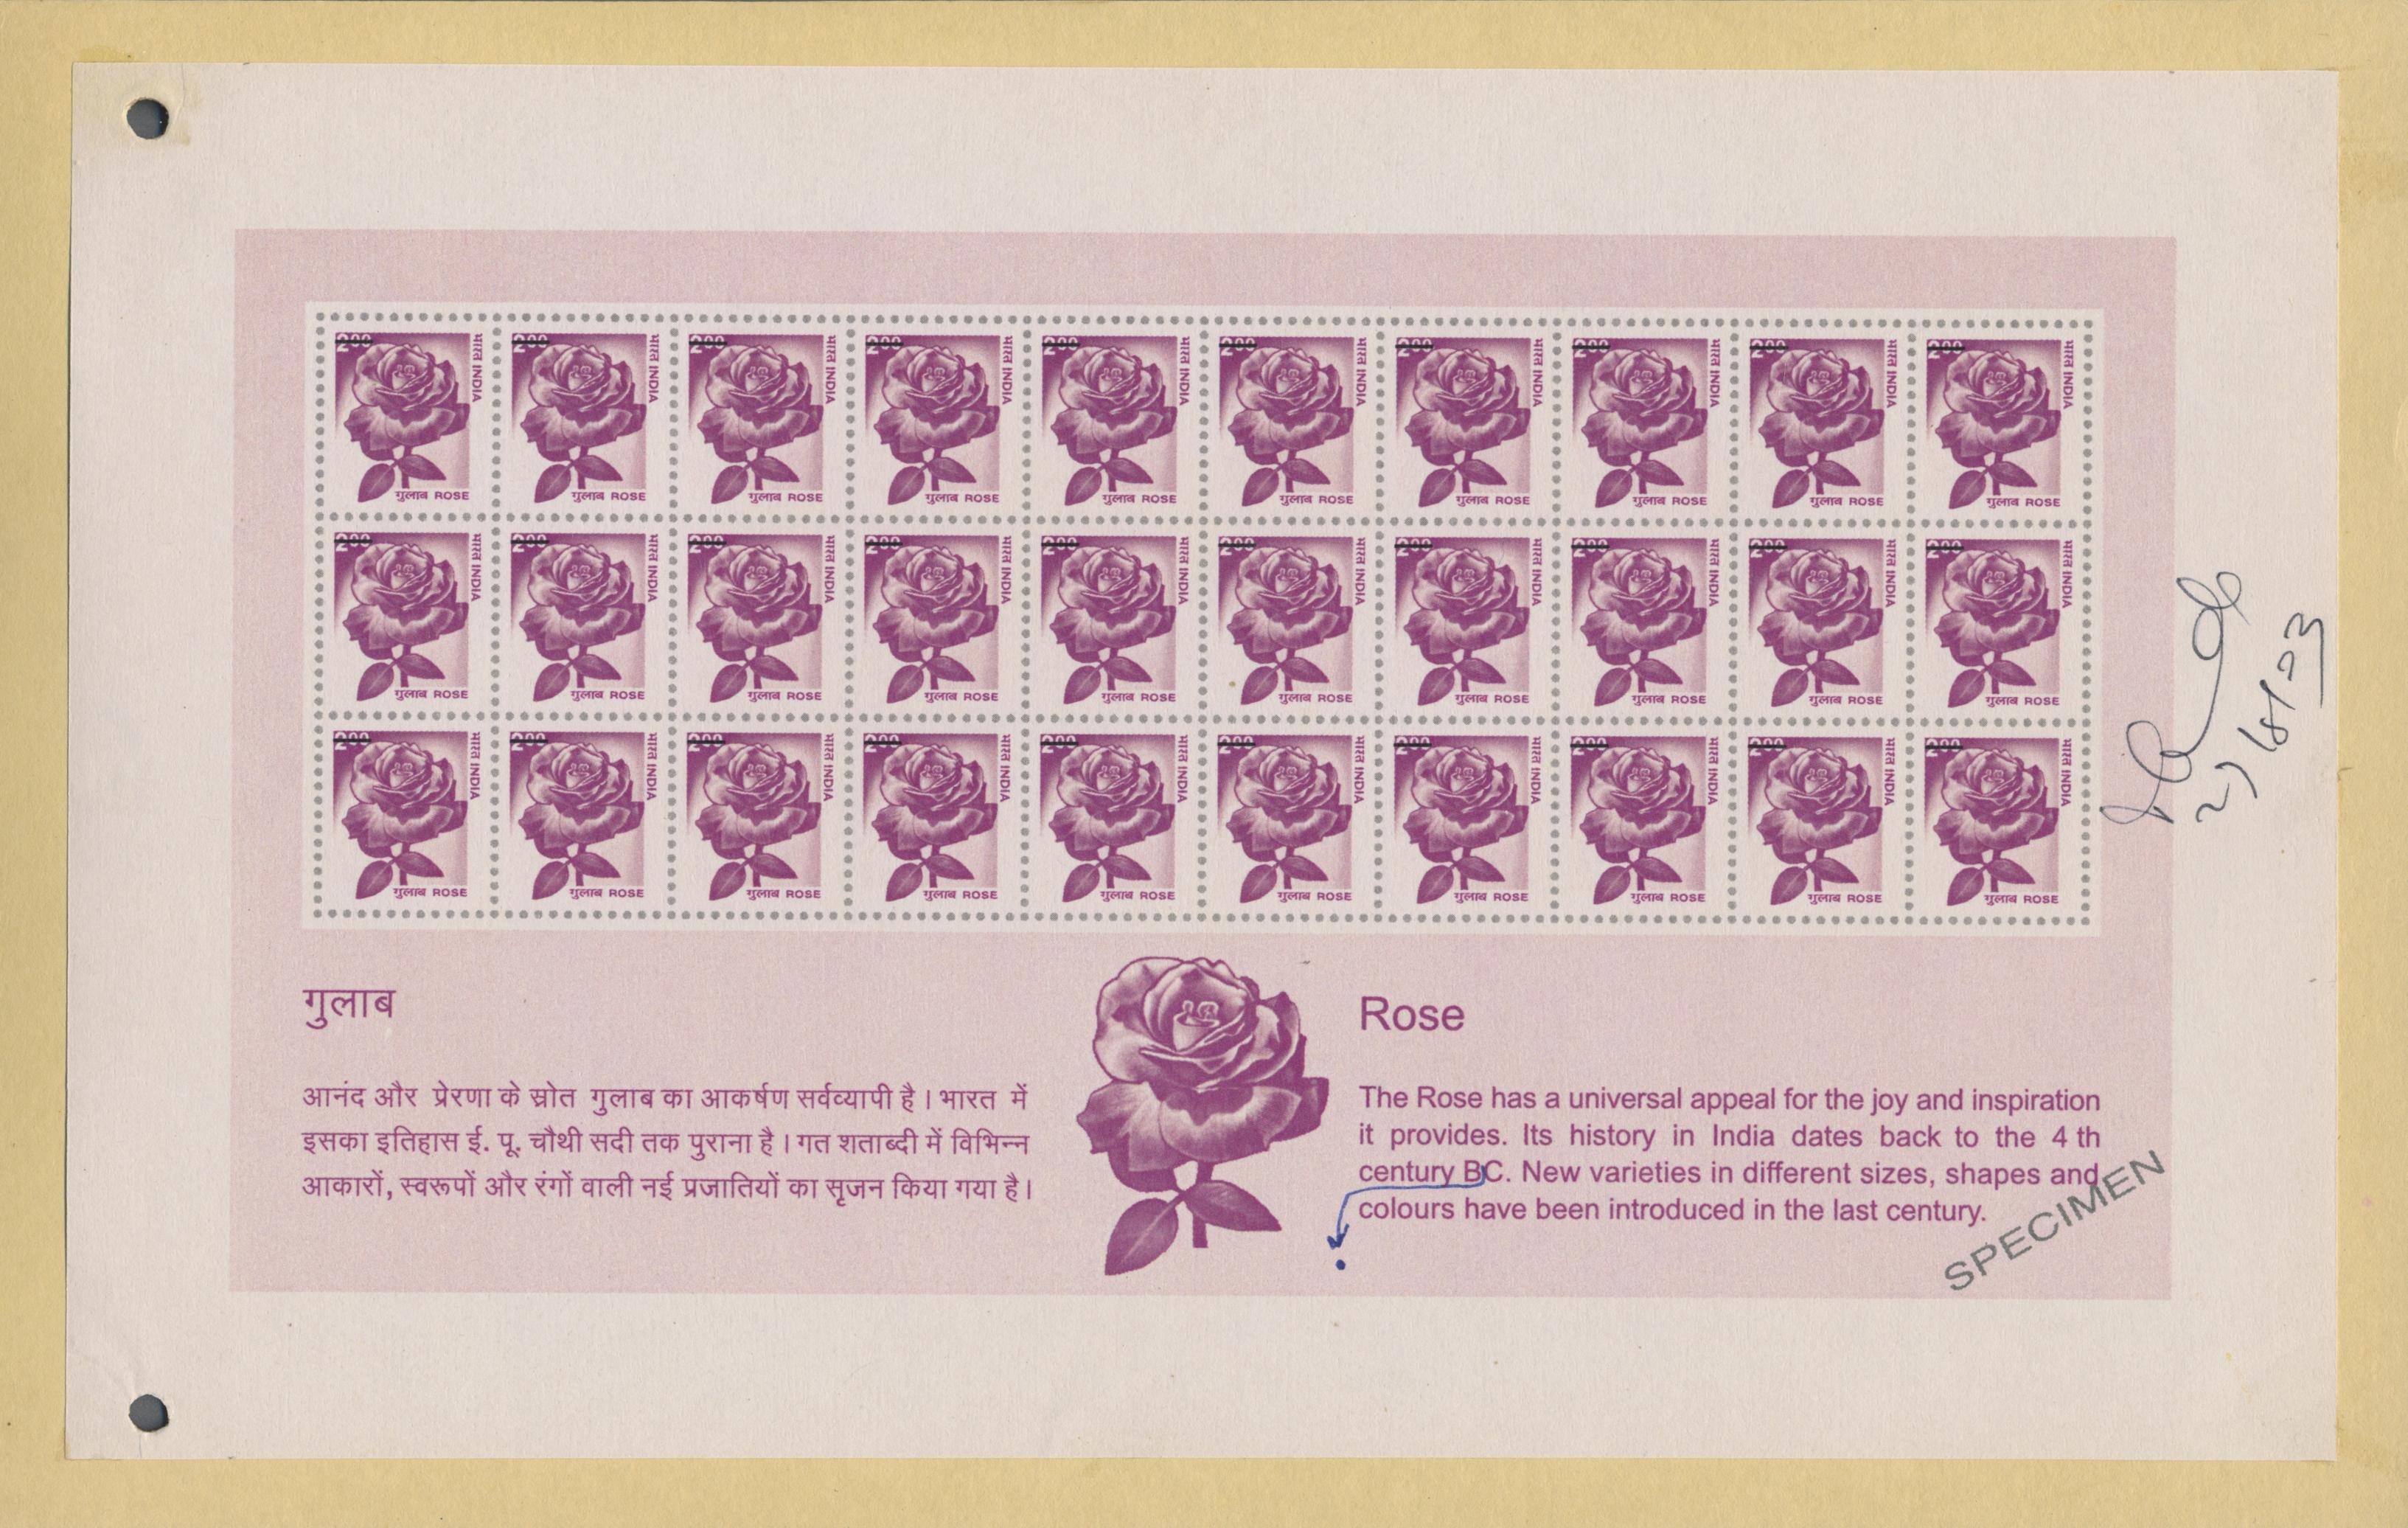 Lot 22908 - Thematik: Flora, Botanik / flora, botany, bloom  -  Auktionshaus Christoph Gärtner GmbH & Co. KG Sale #46 Collections Worldwide